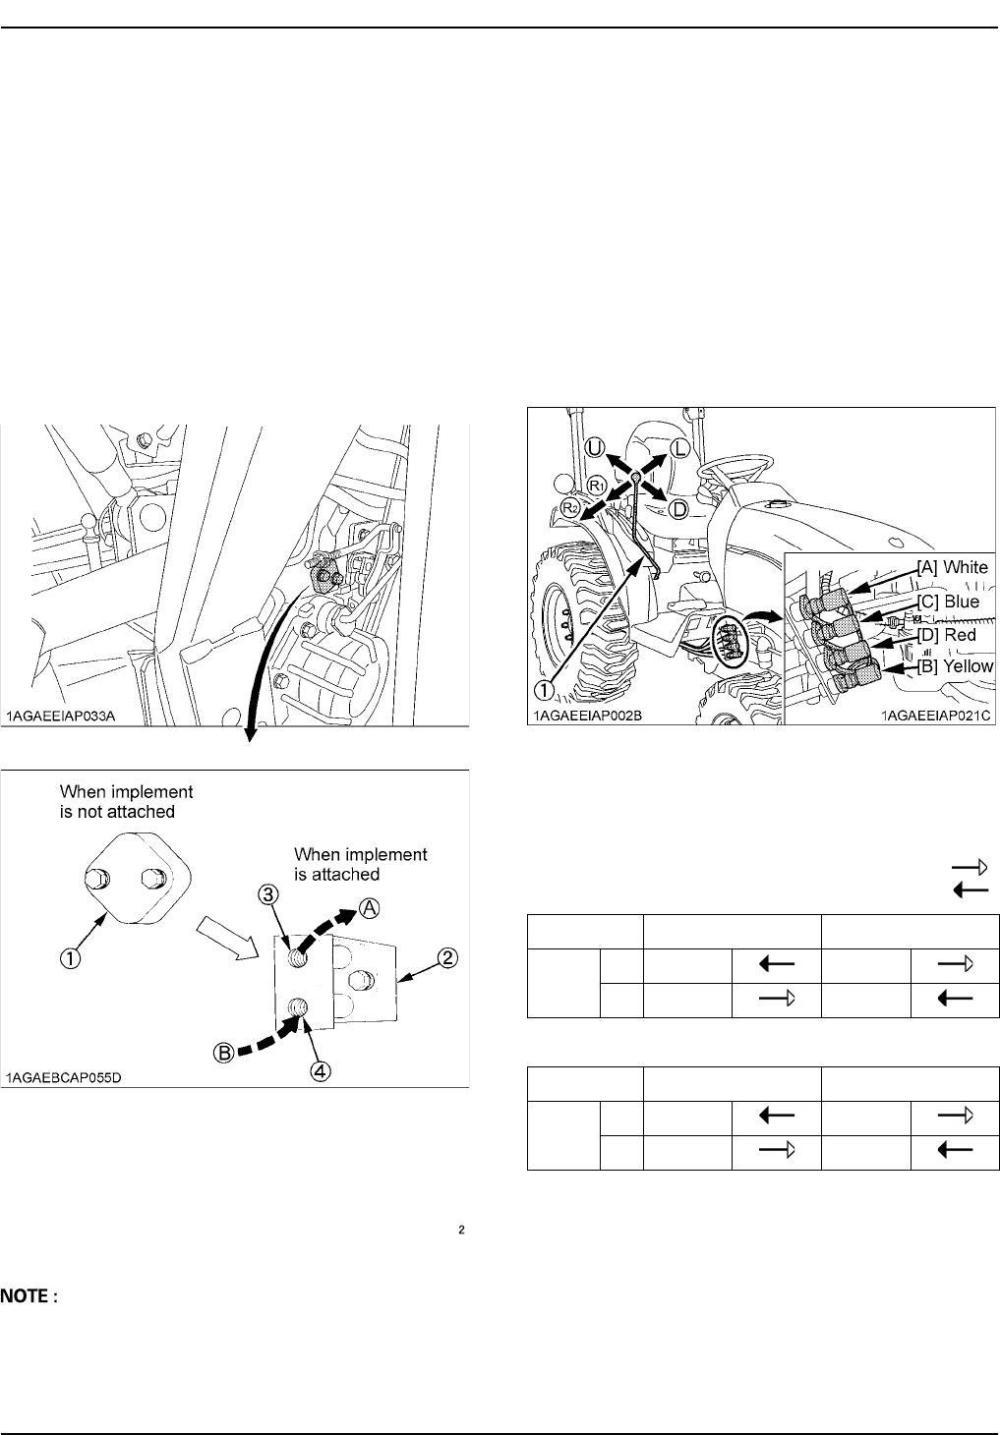 medium resolution of kubota hydraulics diagram data diagram schematickubota hydraulics diagram wiring diagram blog kubota la211 hydraulic diagram kubota